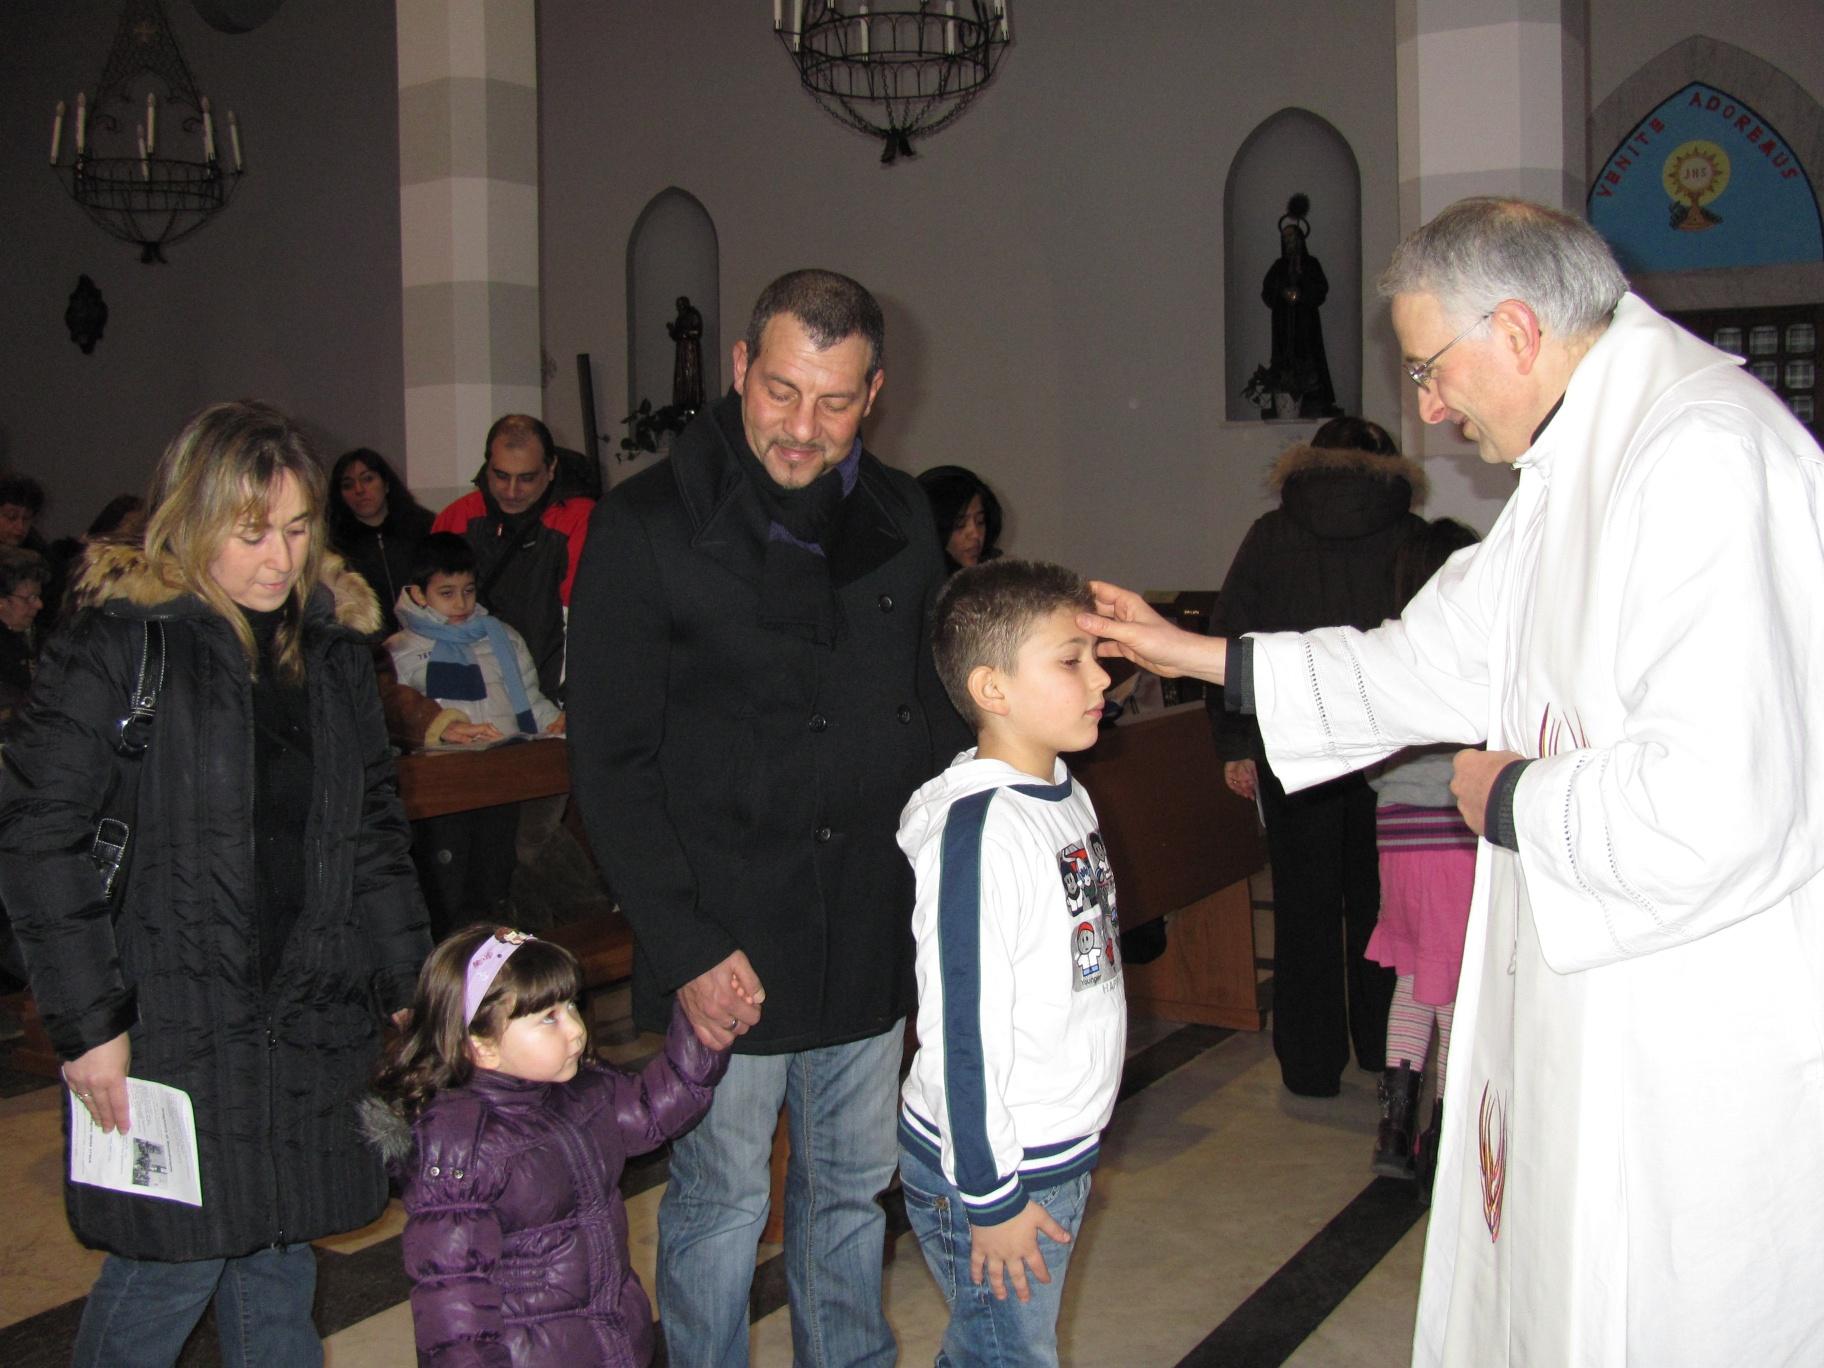 ricordo_battesimo_gesu_2011-01-23-16-29-59